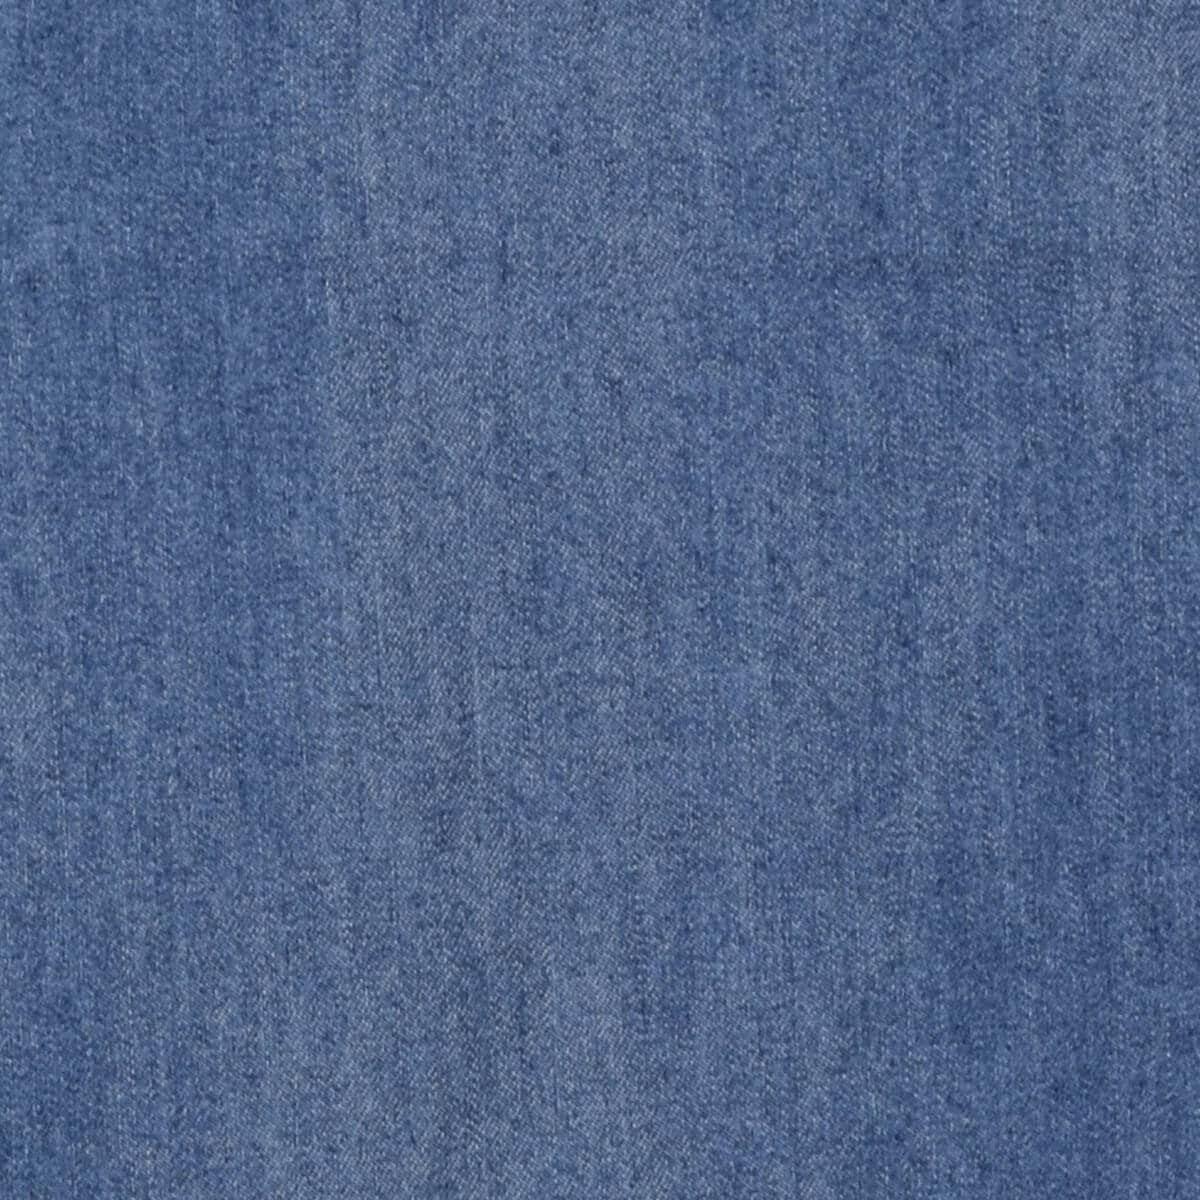 Blusa Color Azul Medio Philosophy Girls